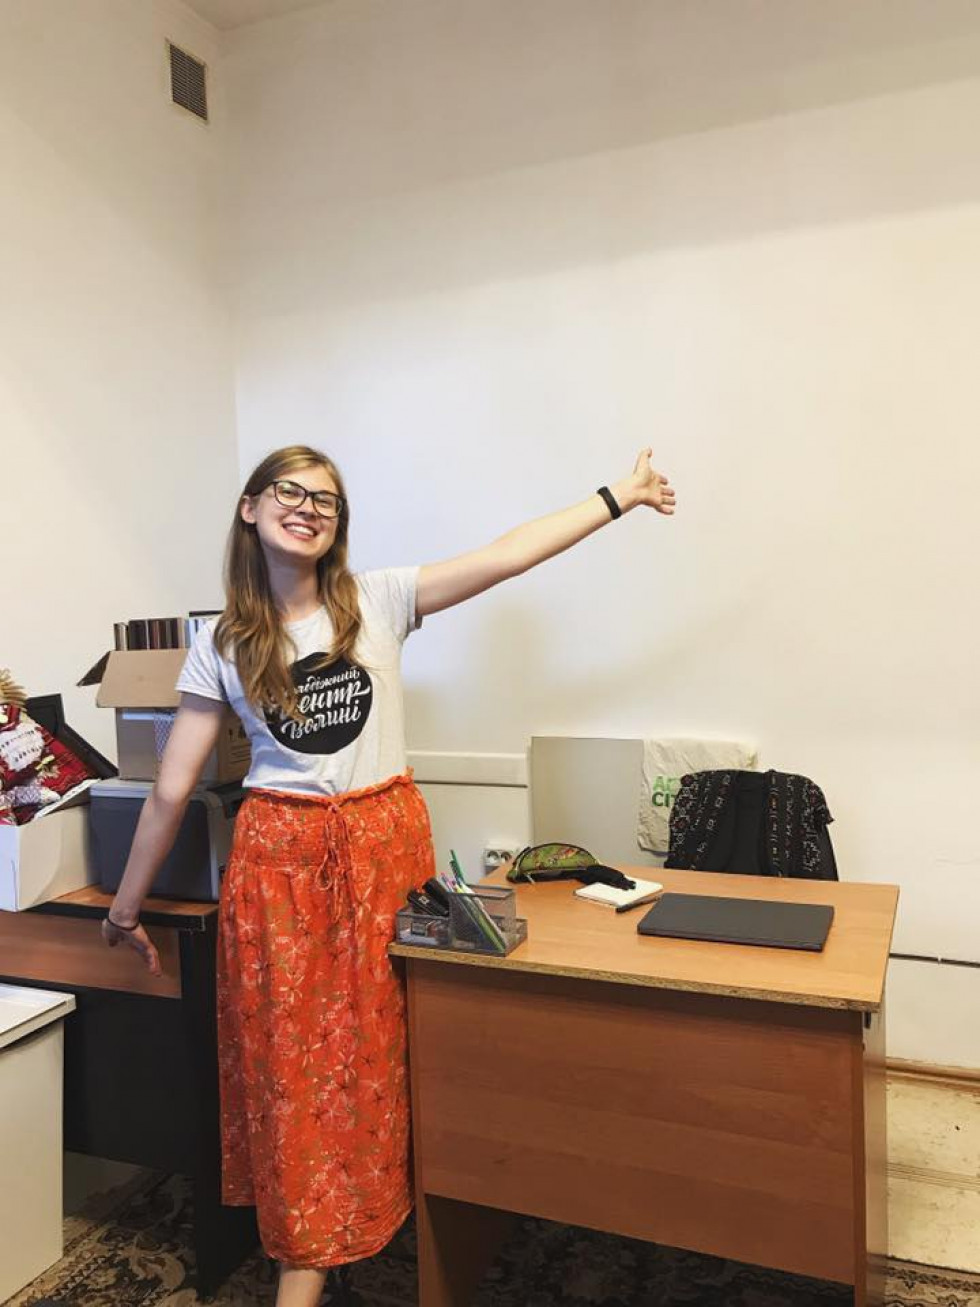 Катерина Білохвіст